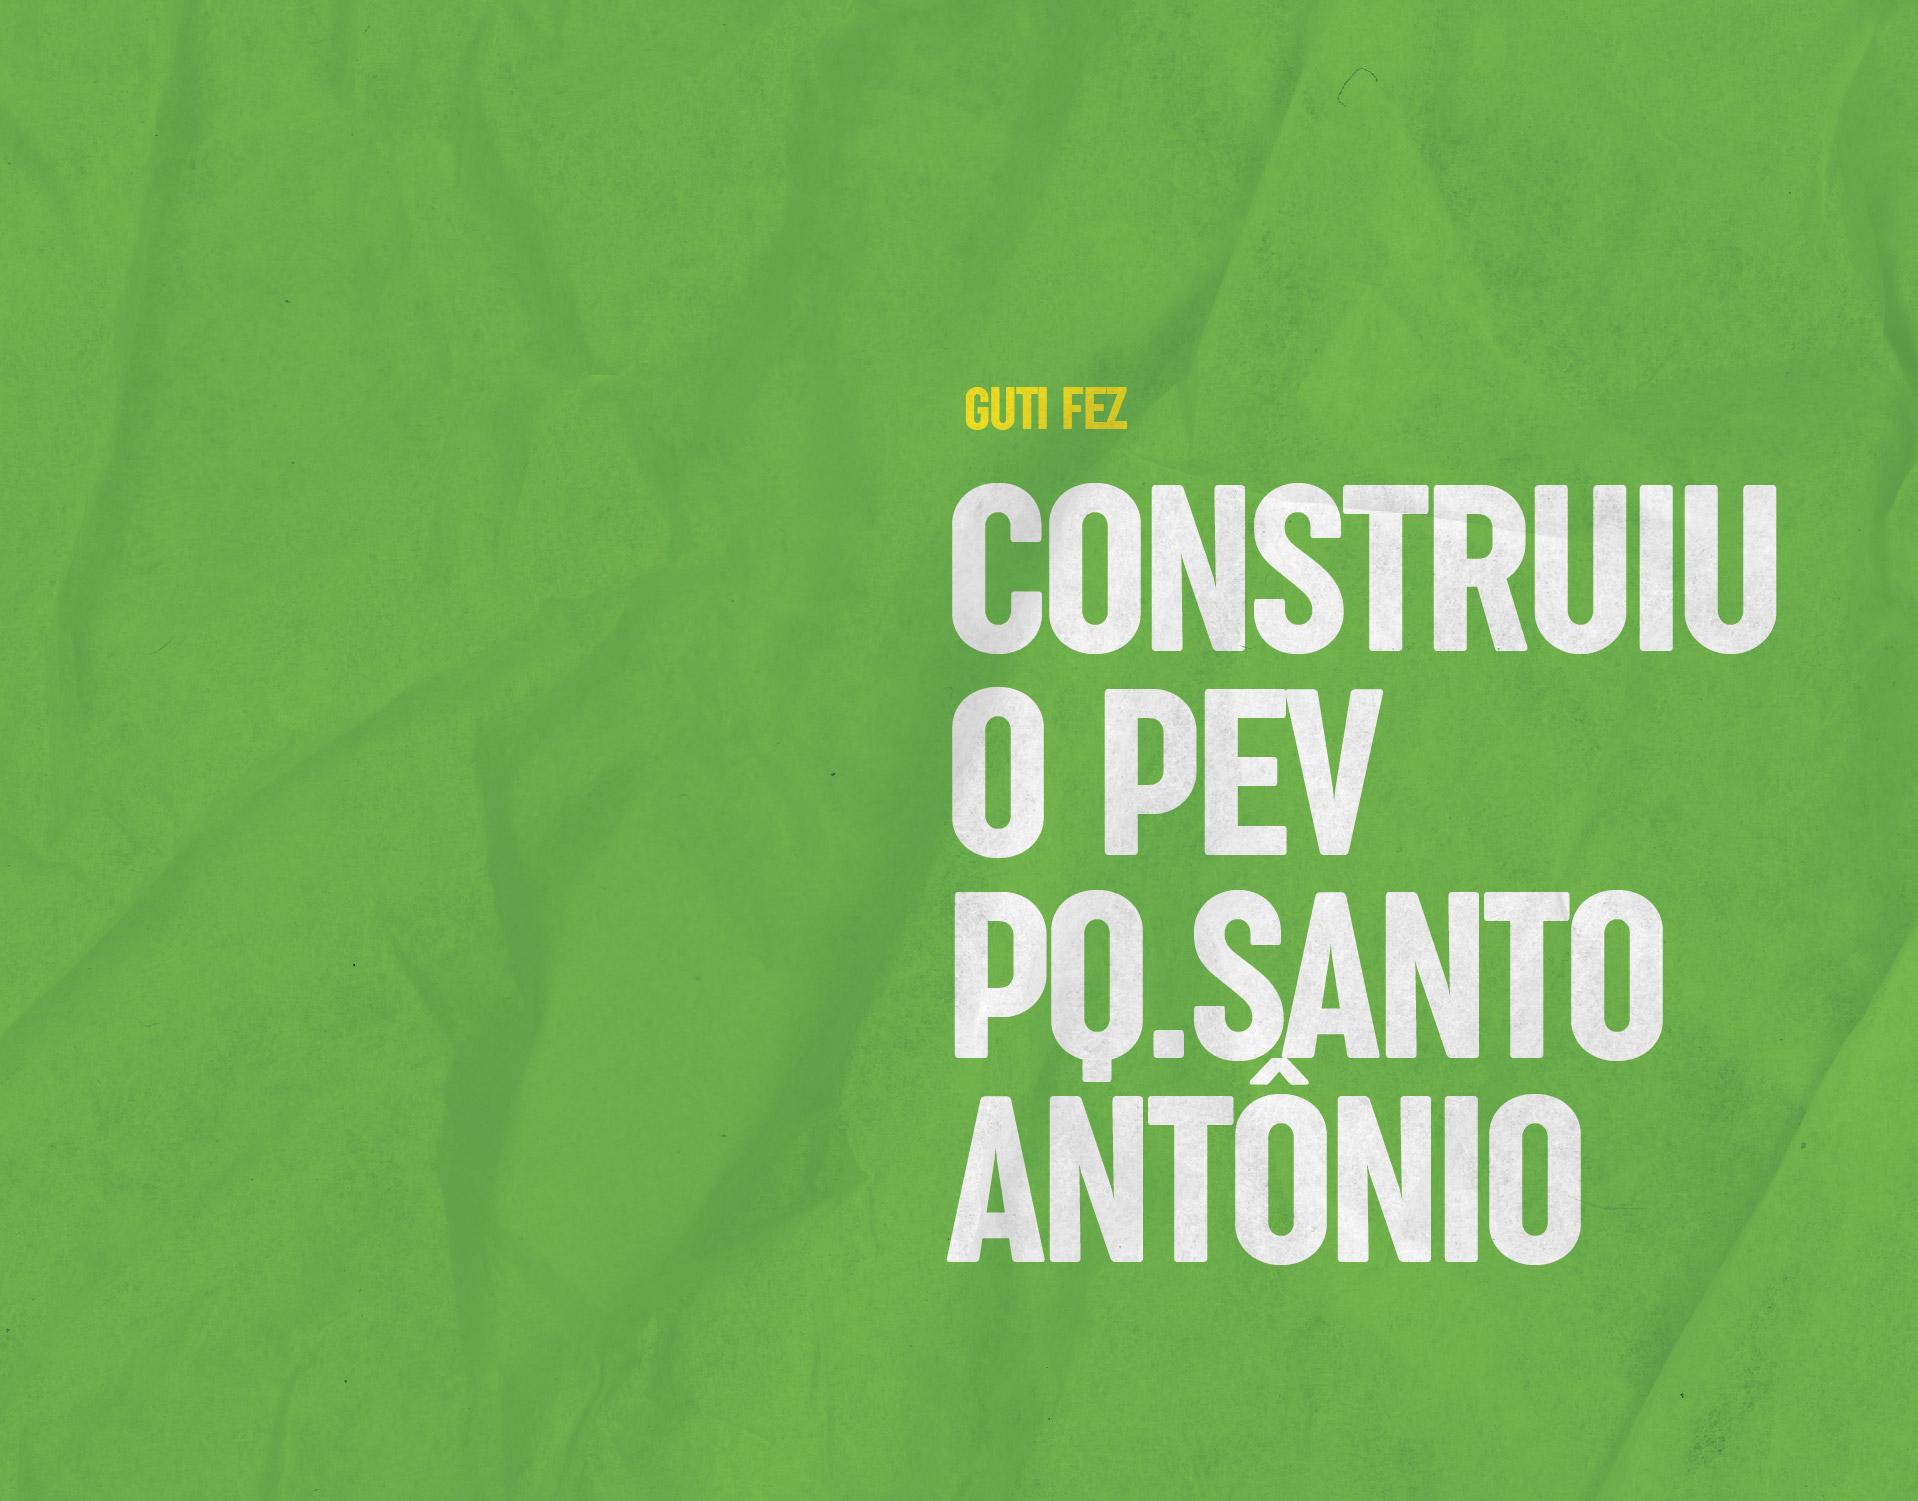 Construiu o PEV Pq. Santo Antônio